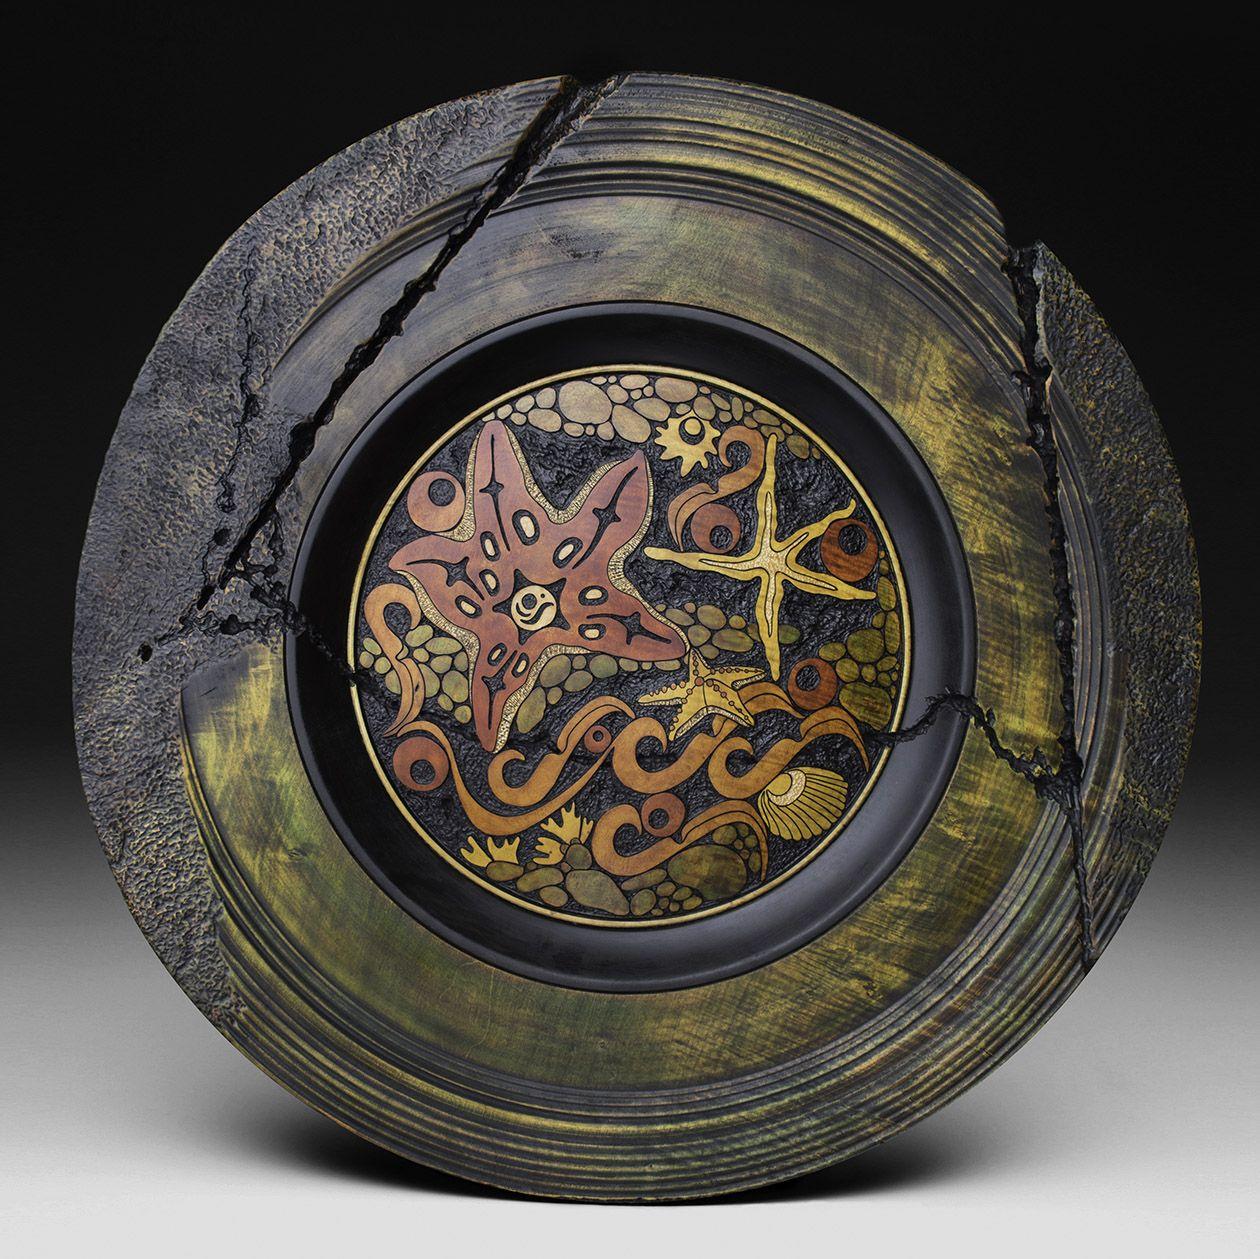 Tidal stars pottery pinterest wood turning jar art and wood